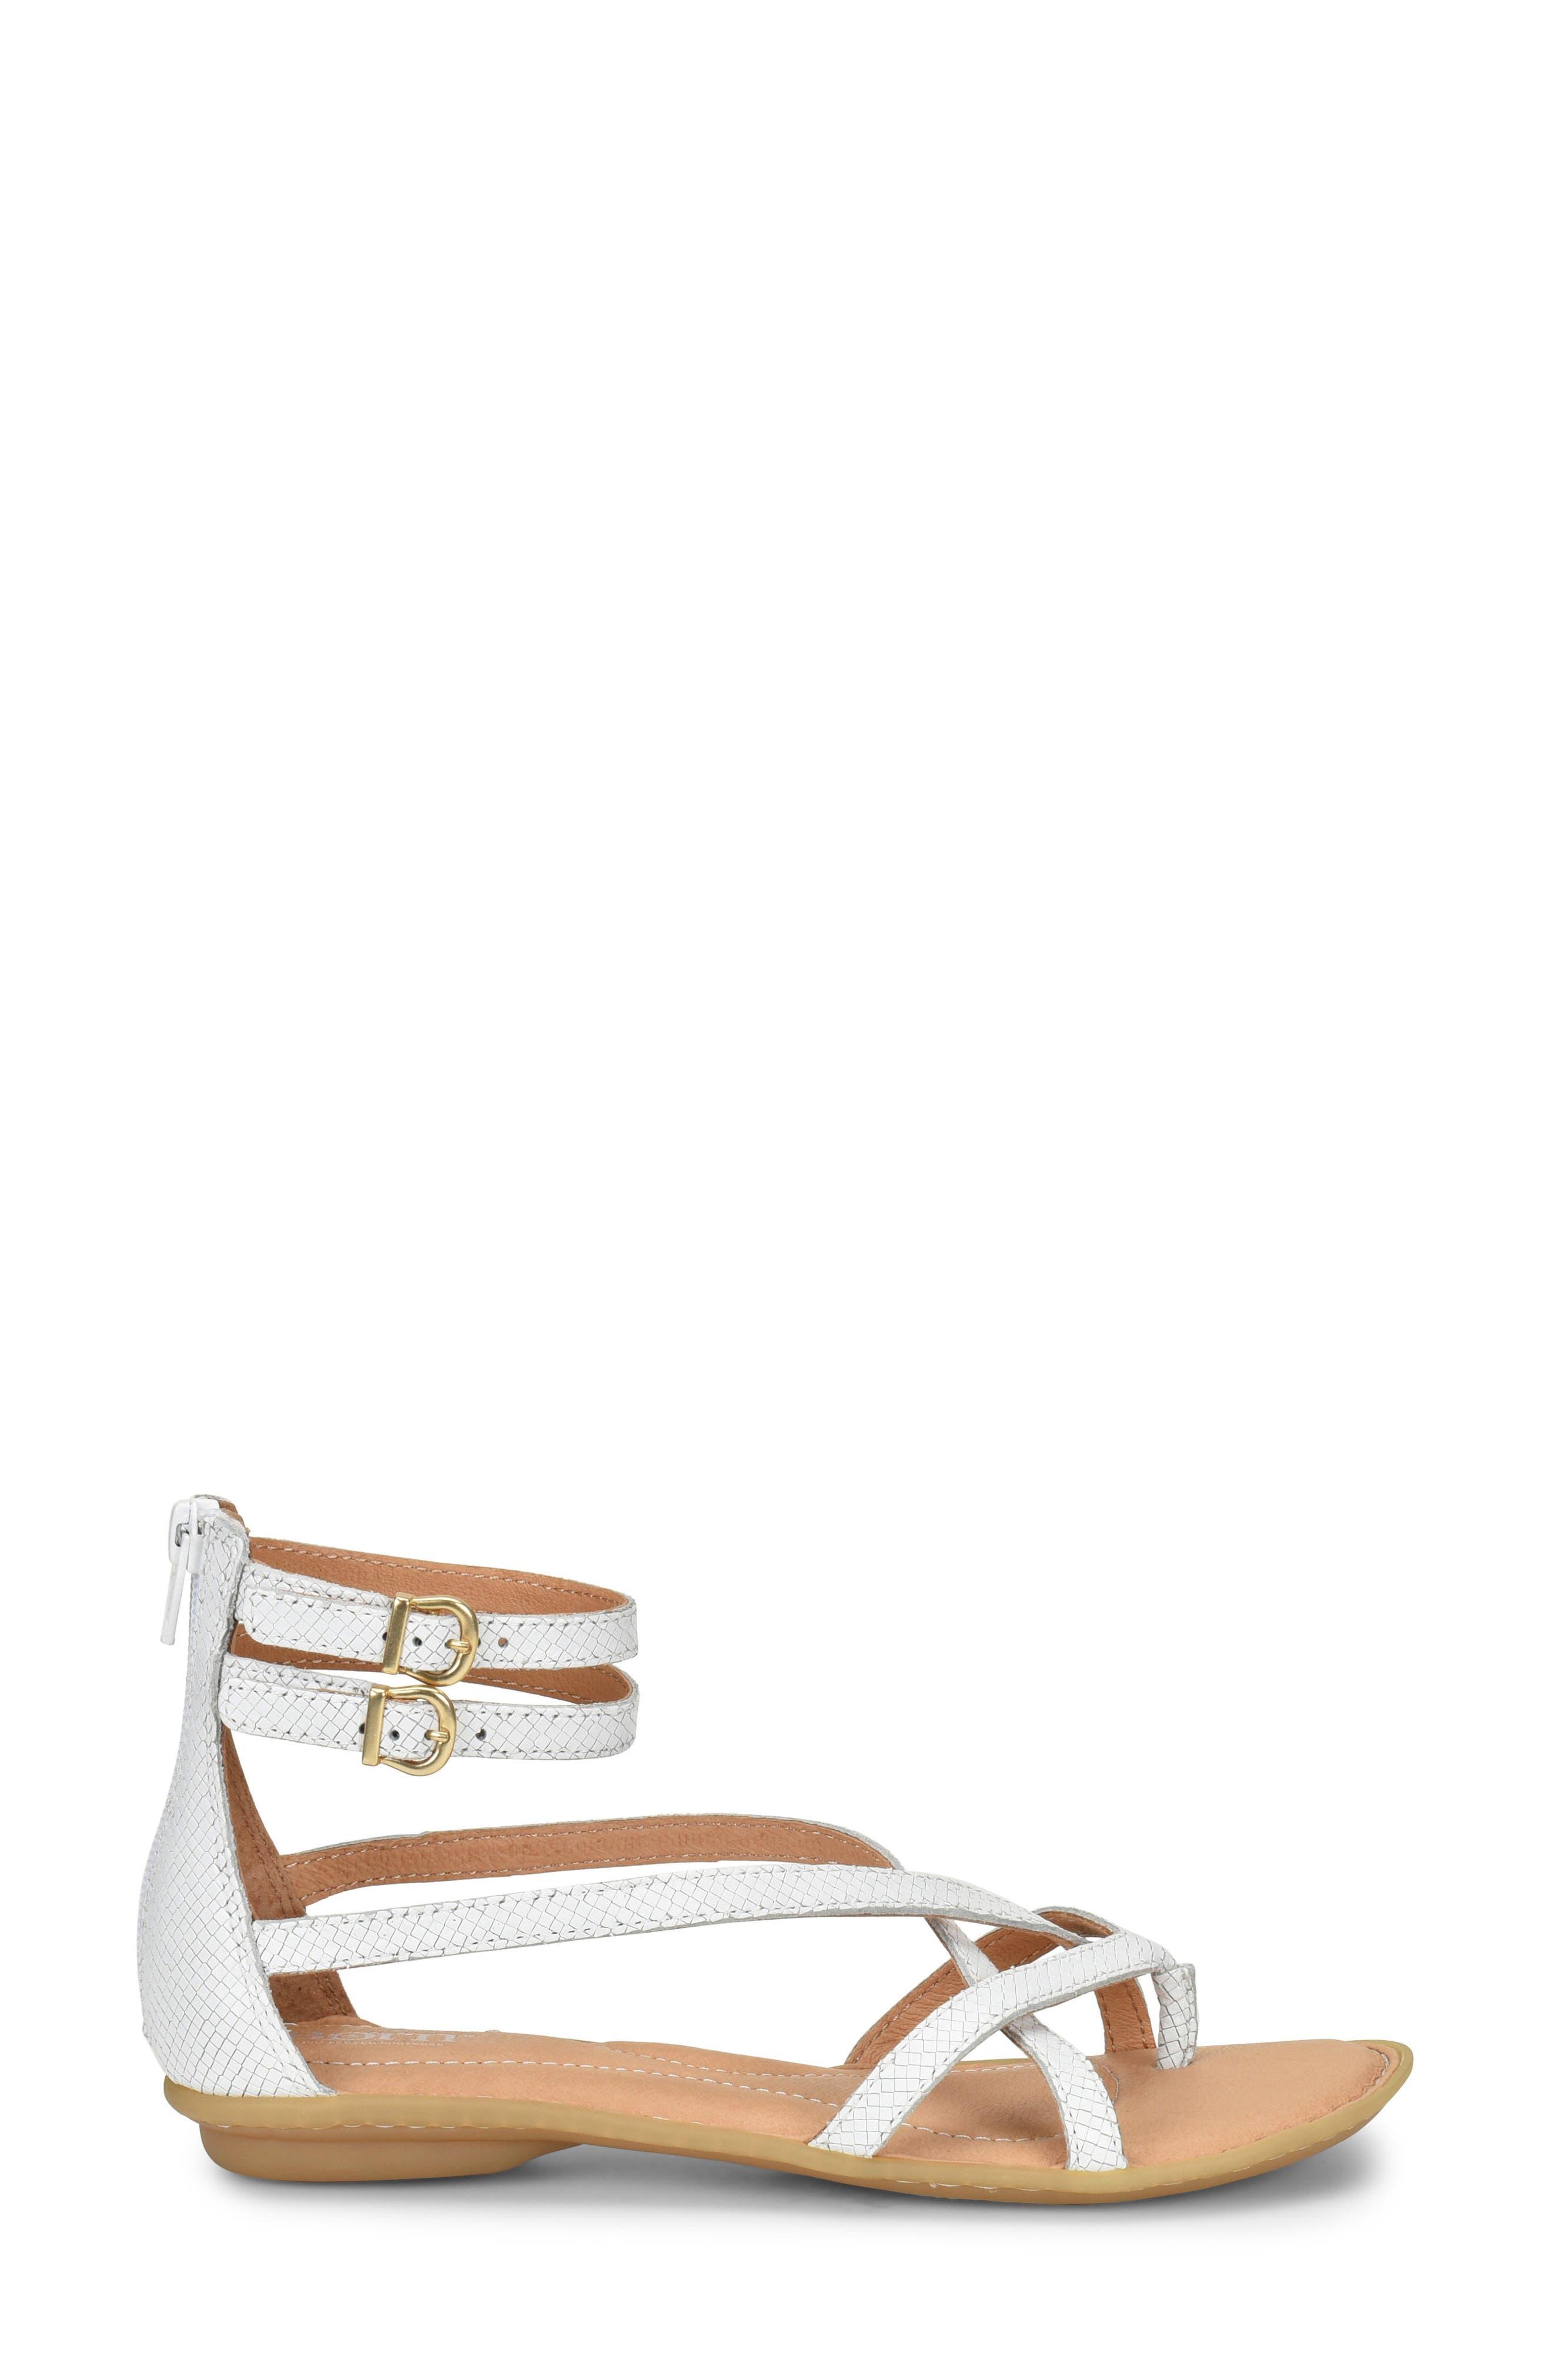 Mai Gladiator Sandal,                             Alternate thumbnail 3, color,                             White Leather